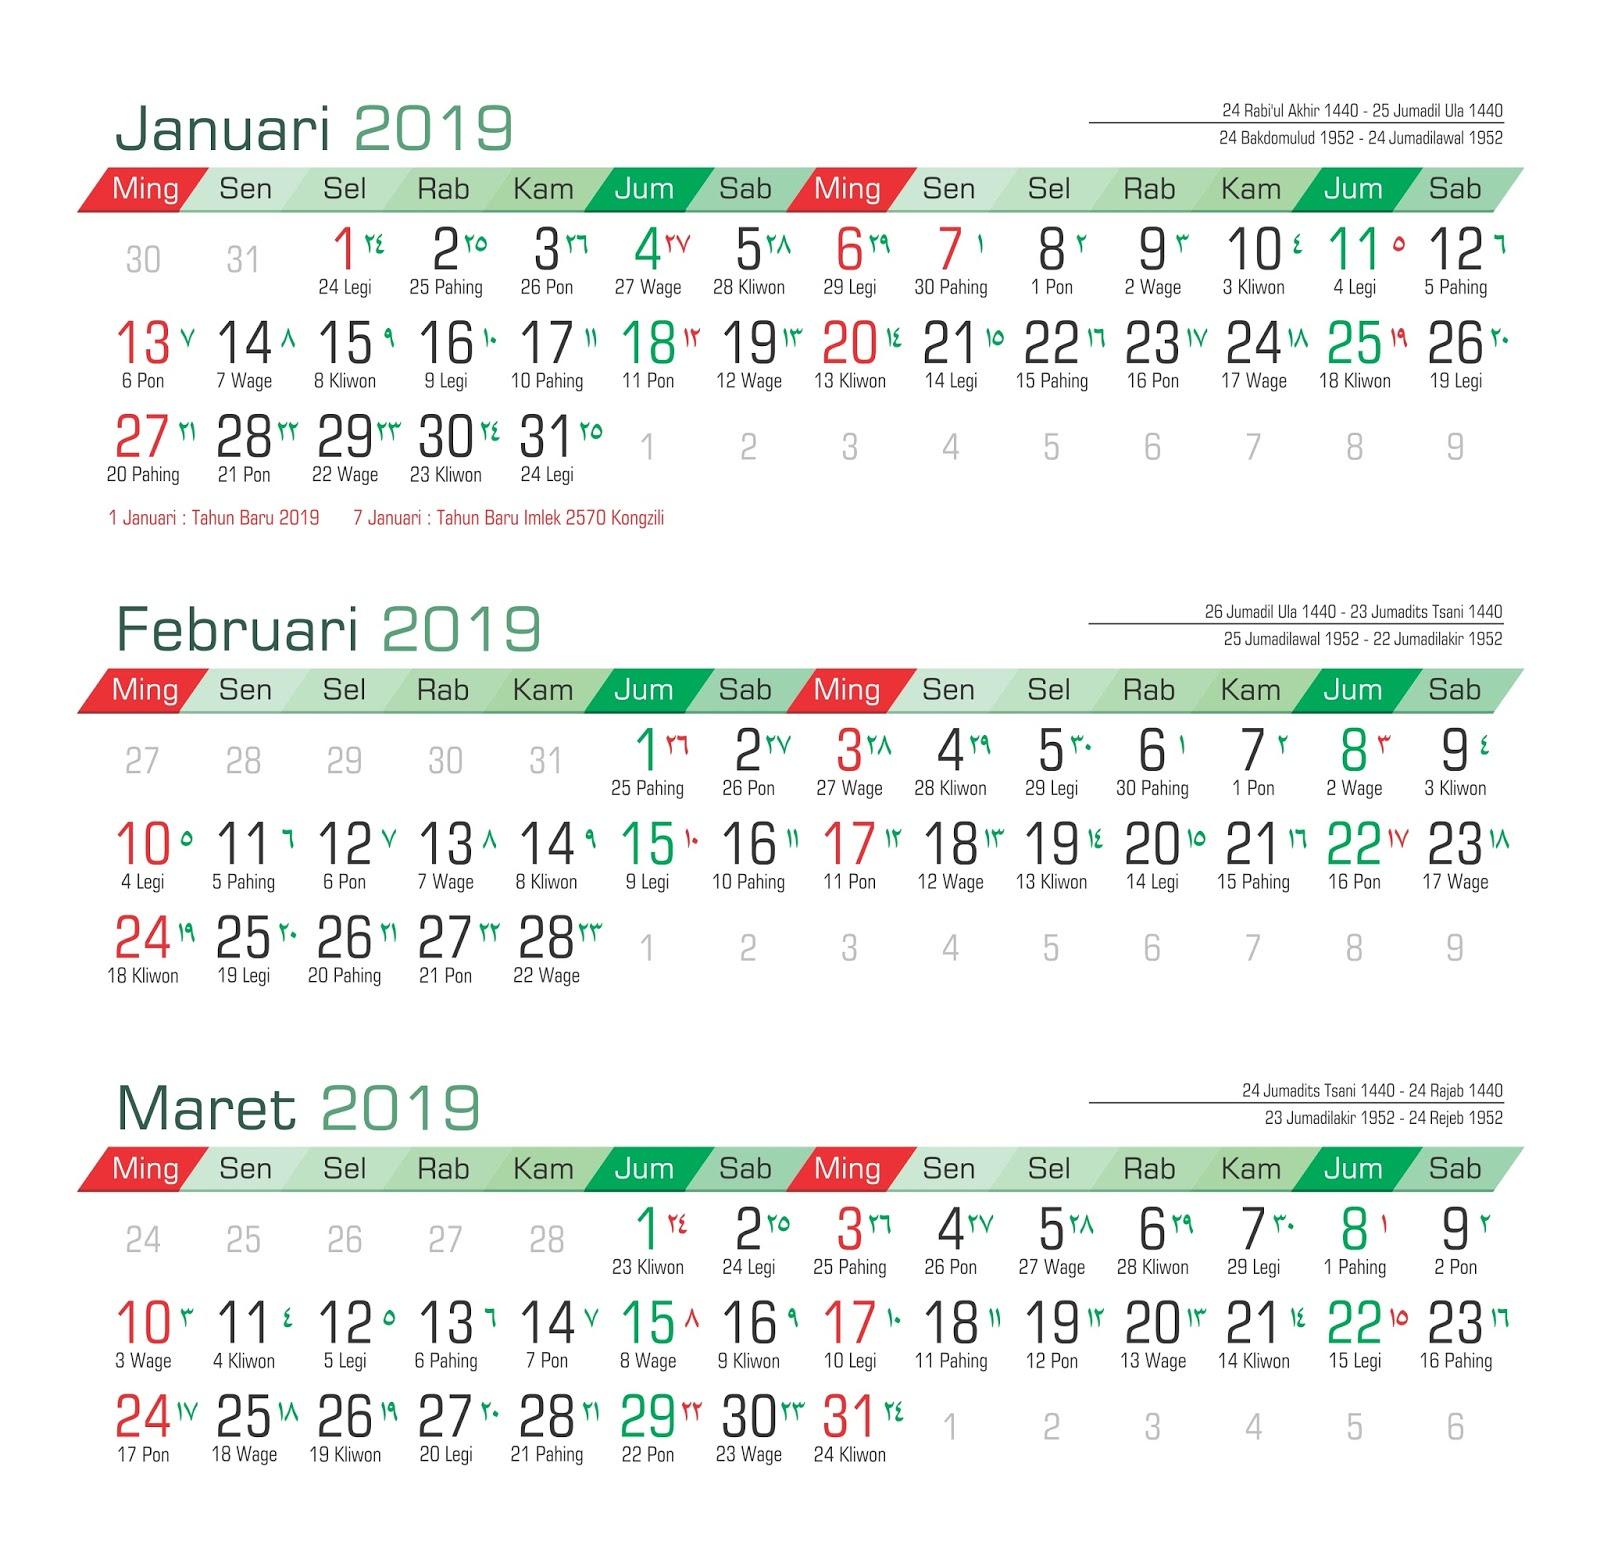 calendar template 2020 corel draw calendar online 2019. Black Bedroom Furniture Sets. Home Design Ideas